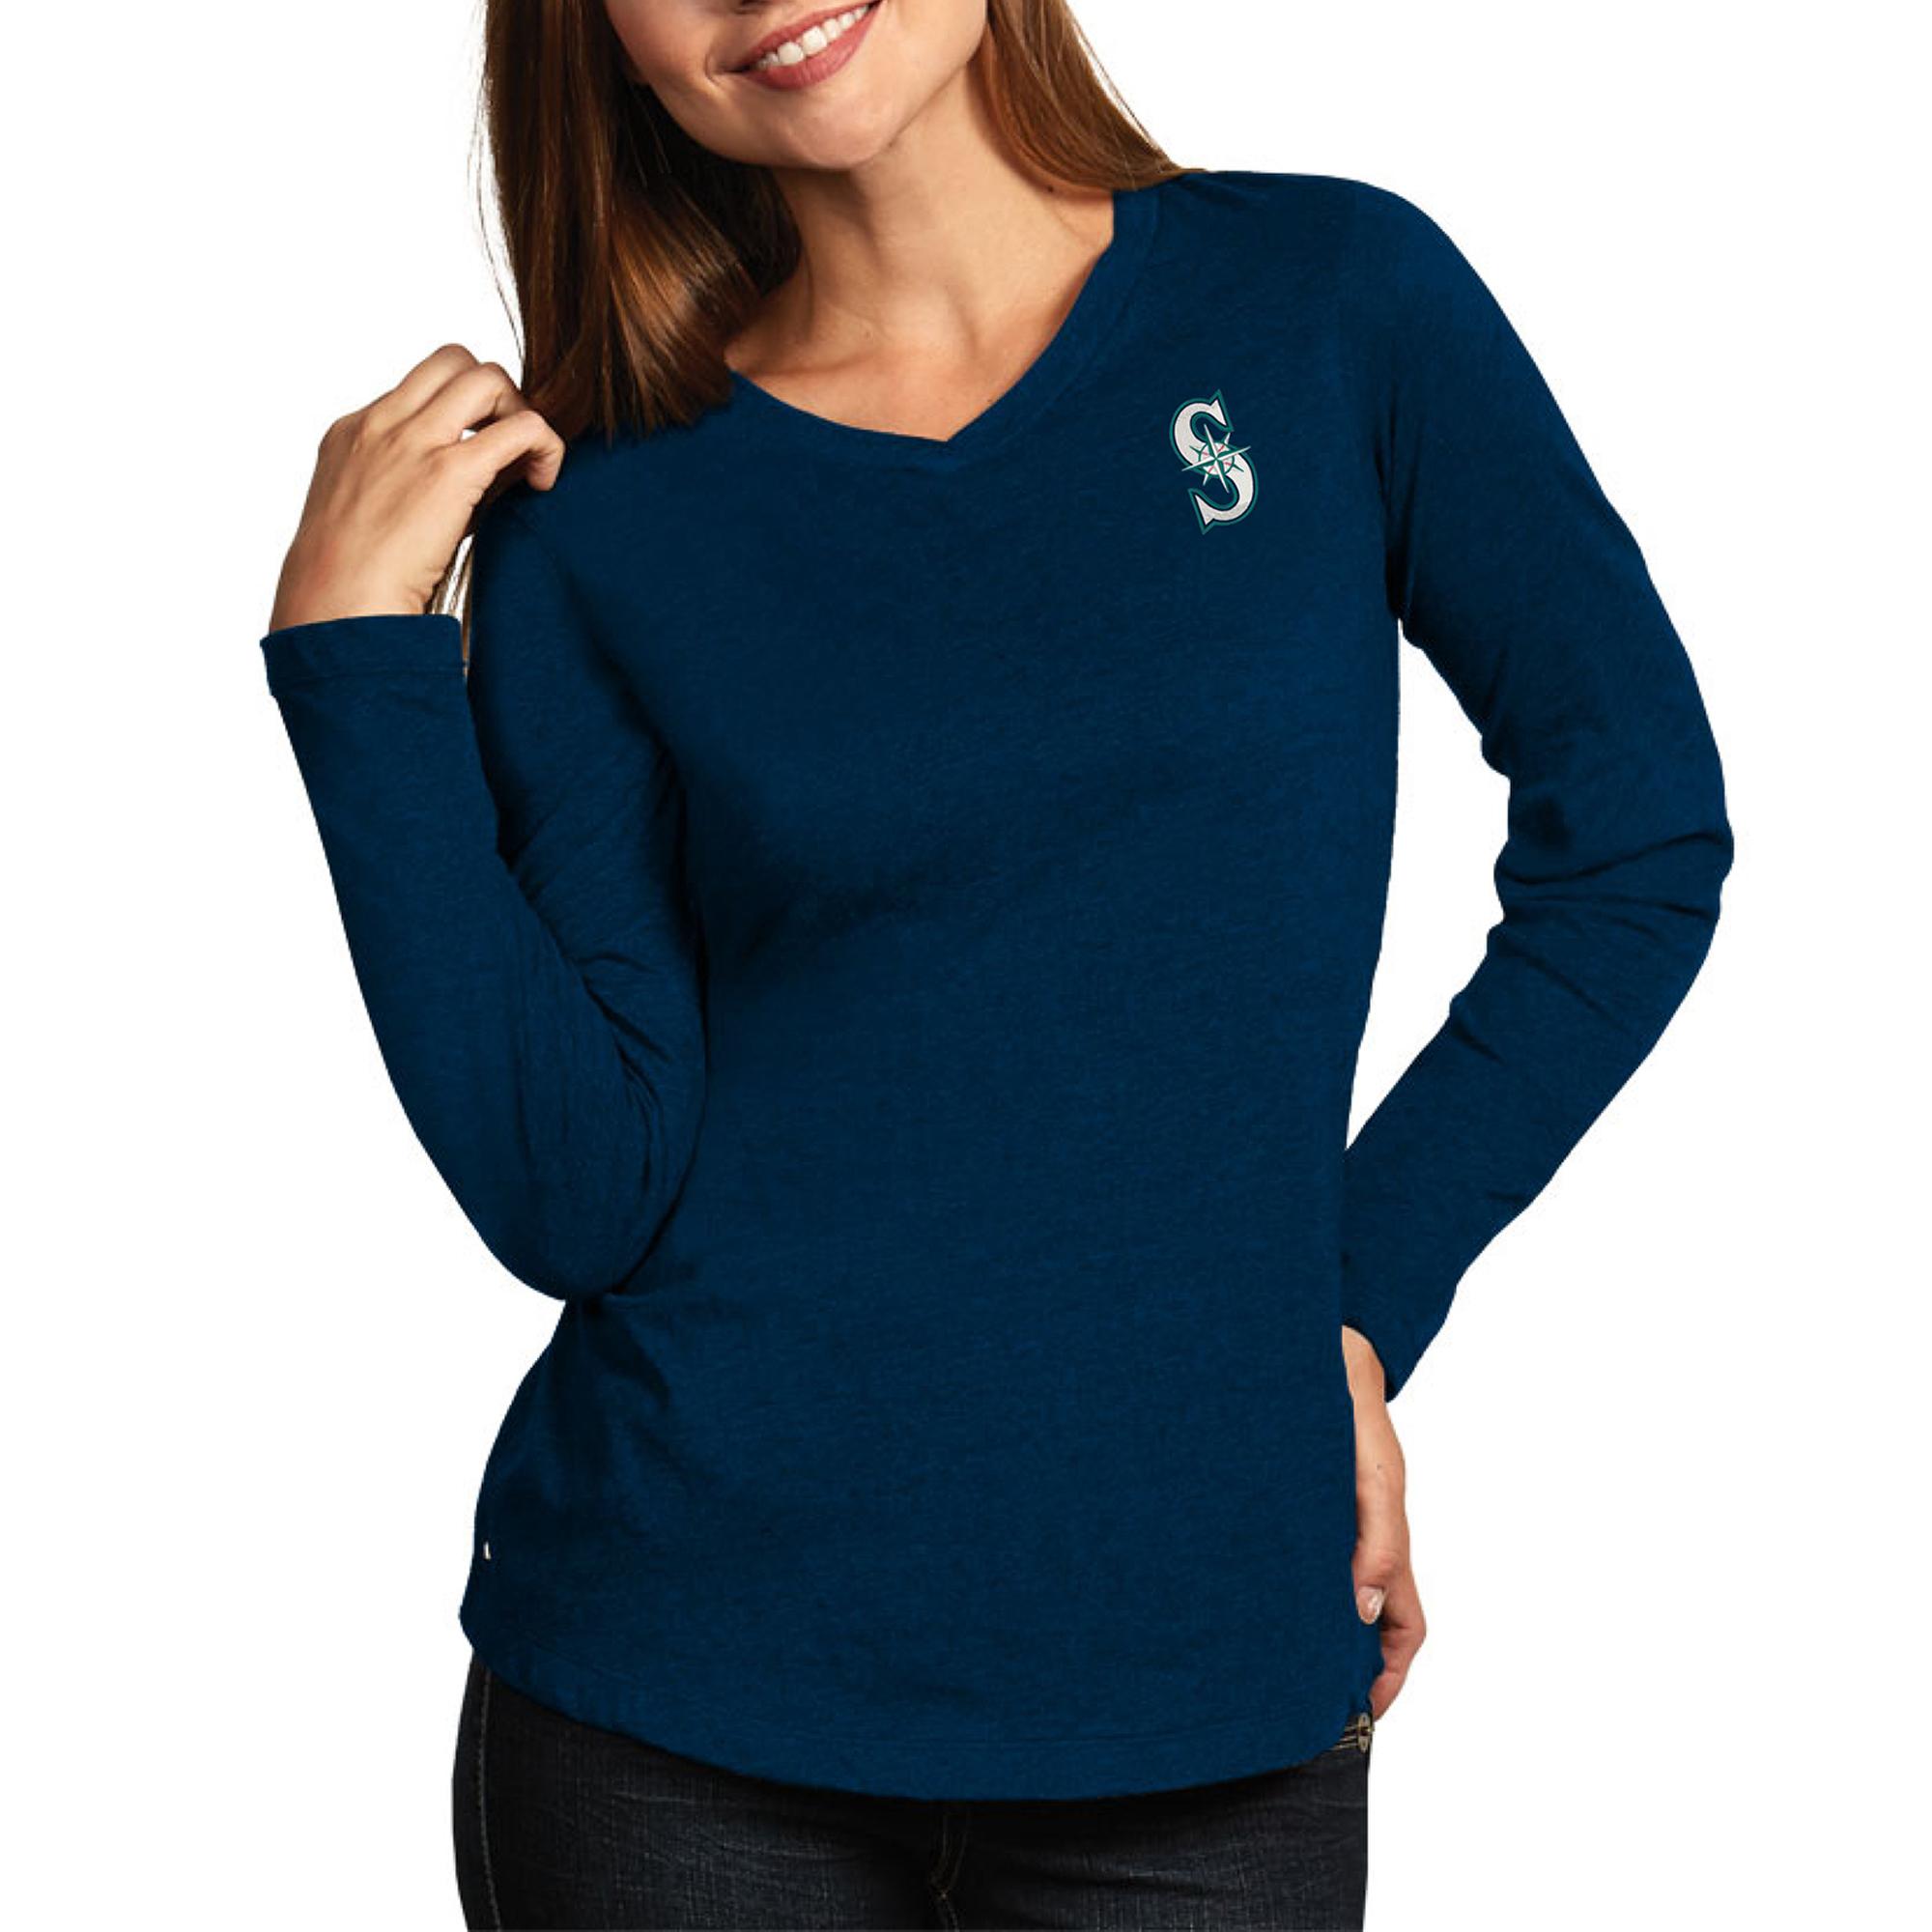 Seattle Mariners Antigua Women's Flip Long Sleeve T-Shirt - Heather Navy